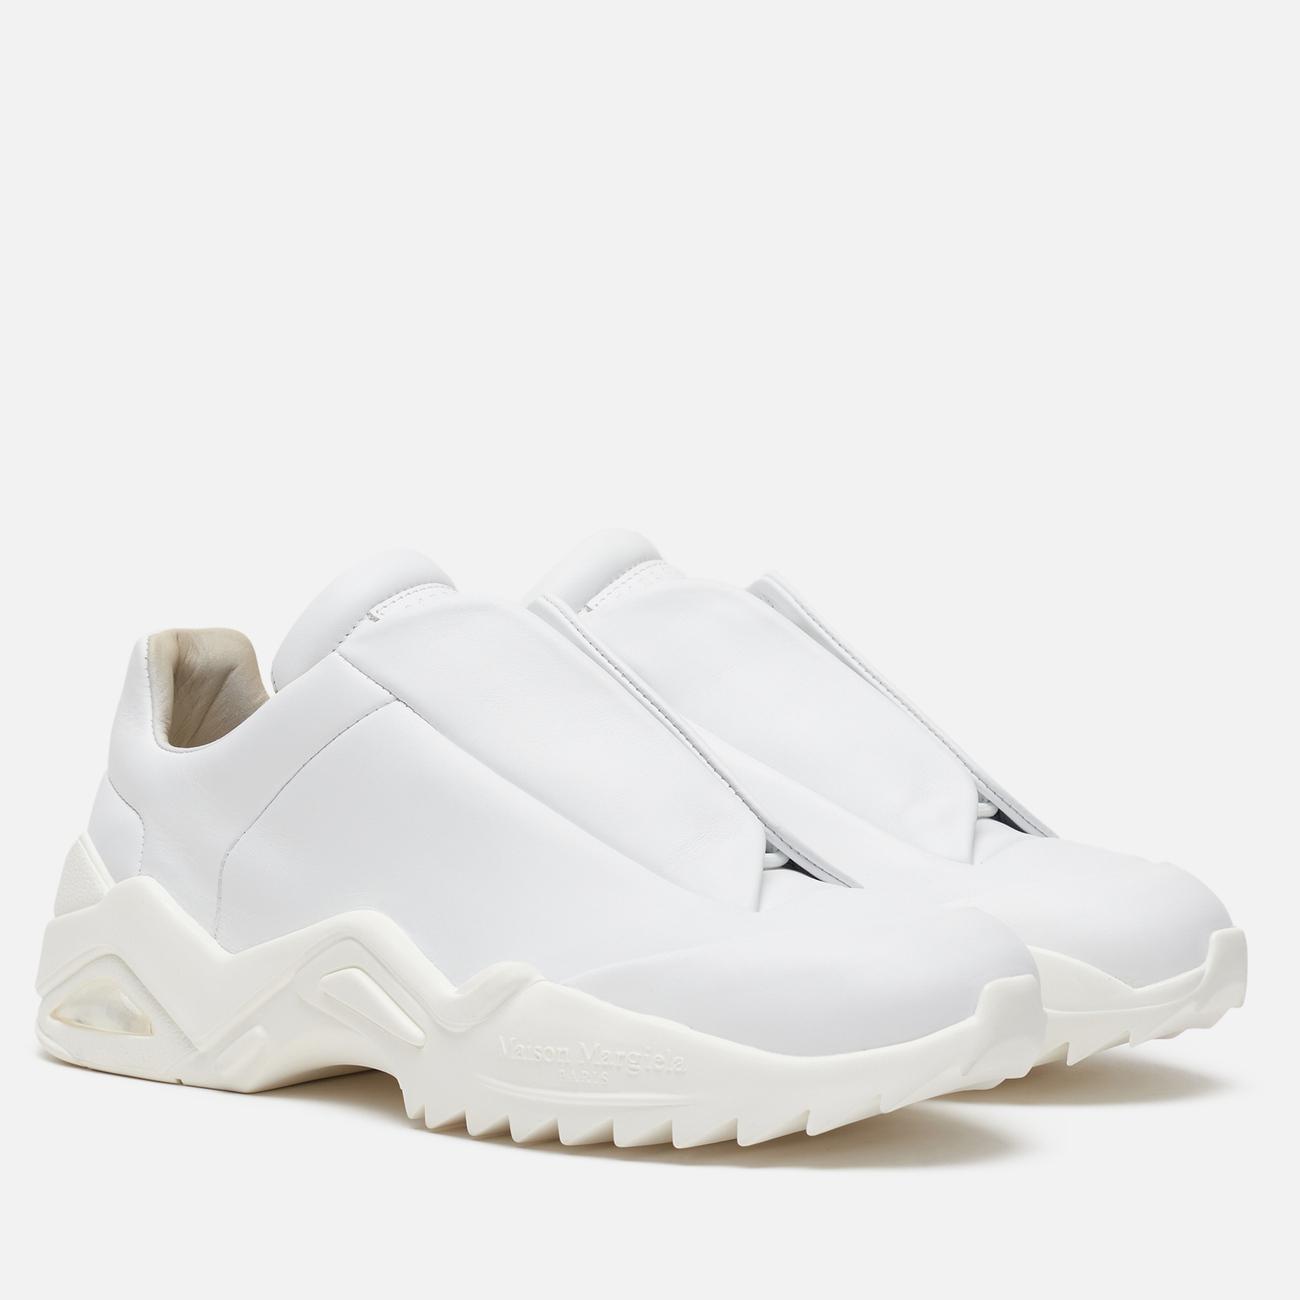 Мужские кроссовки Maison Margiela Future II Leather White/White